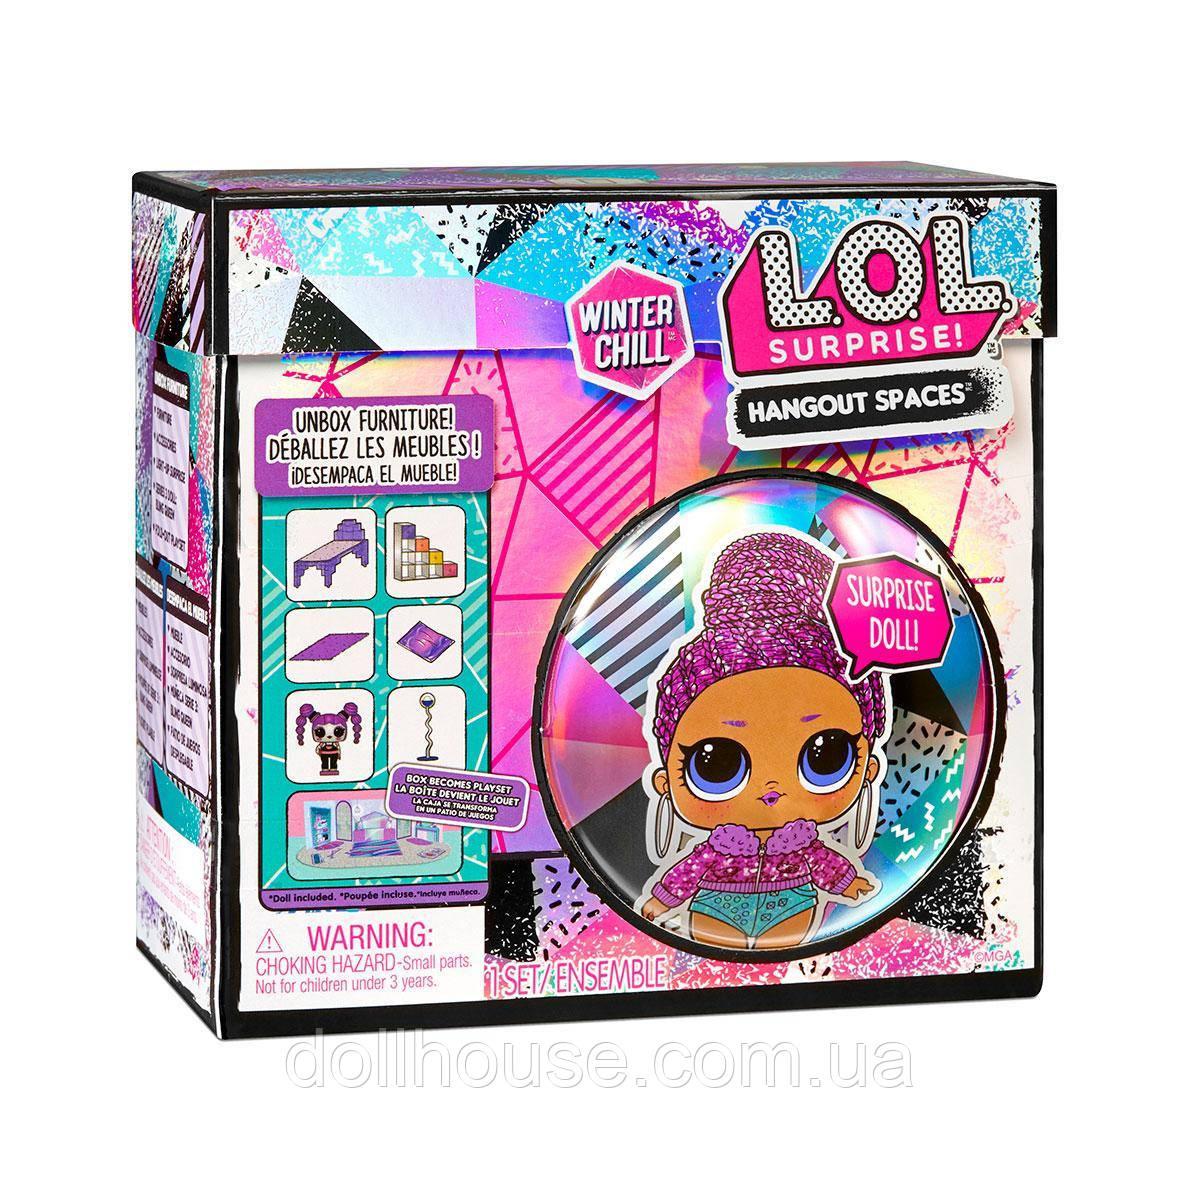 Кукла ЛОЛ LOL SURPRISE! Hangout Spaces Winter Chill Маленькие комнатки - Зимний сьют Королевы Шик 576631